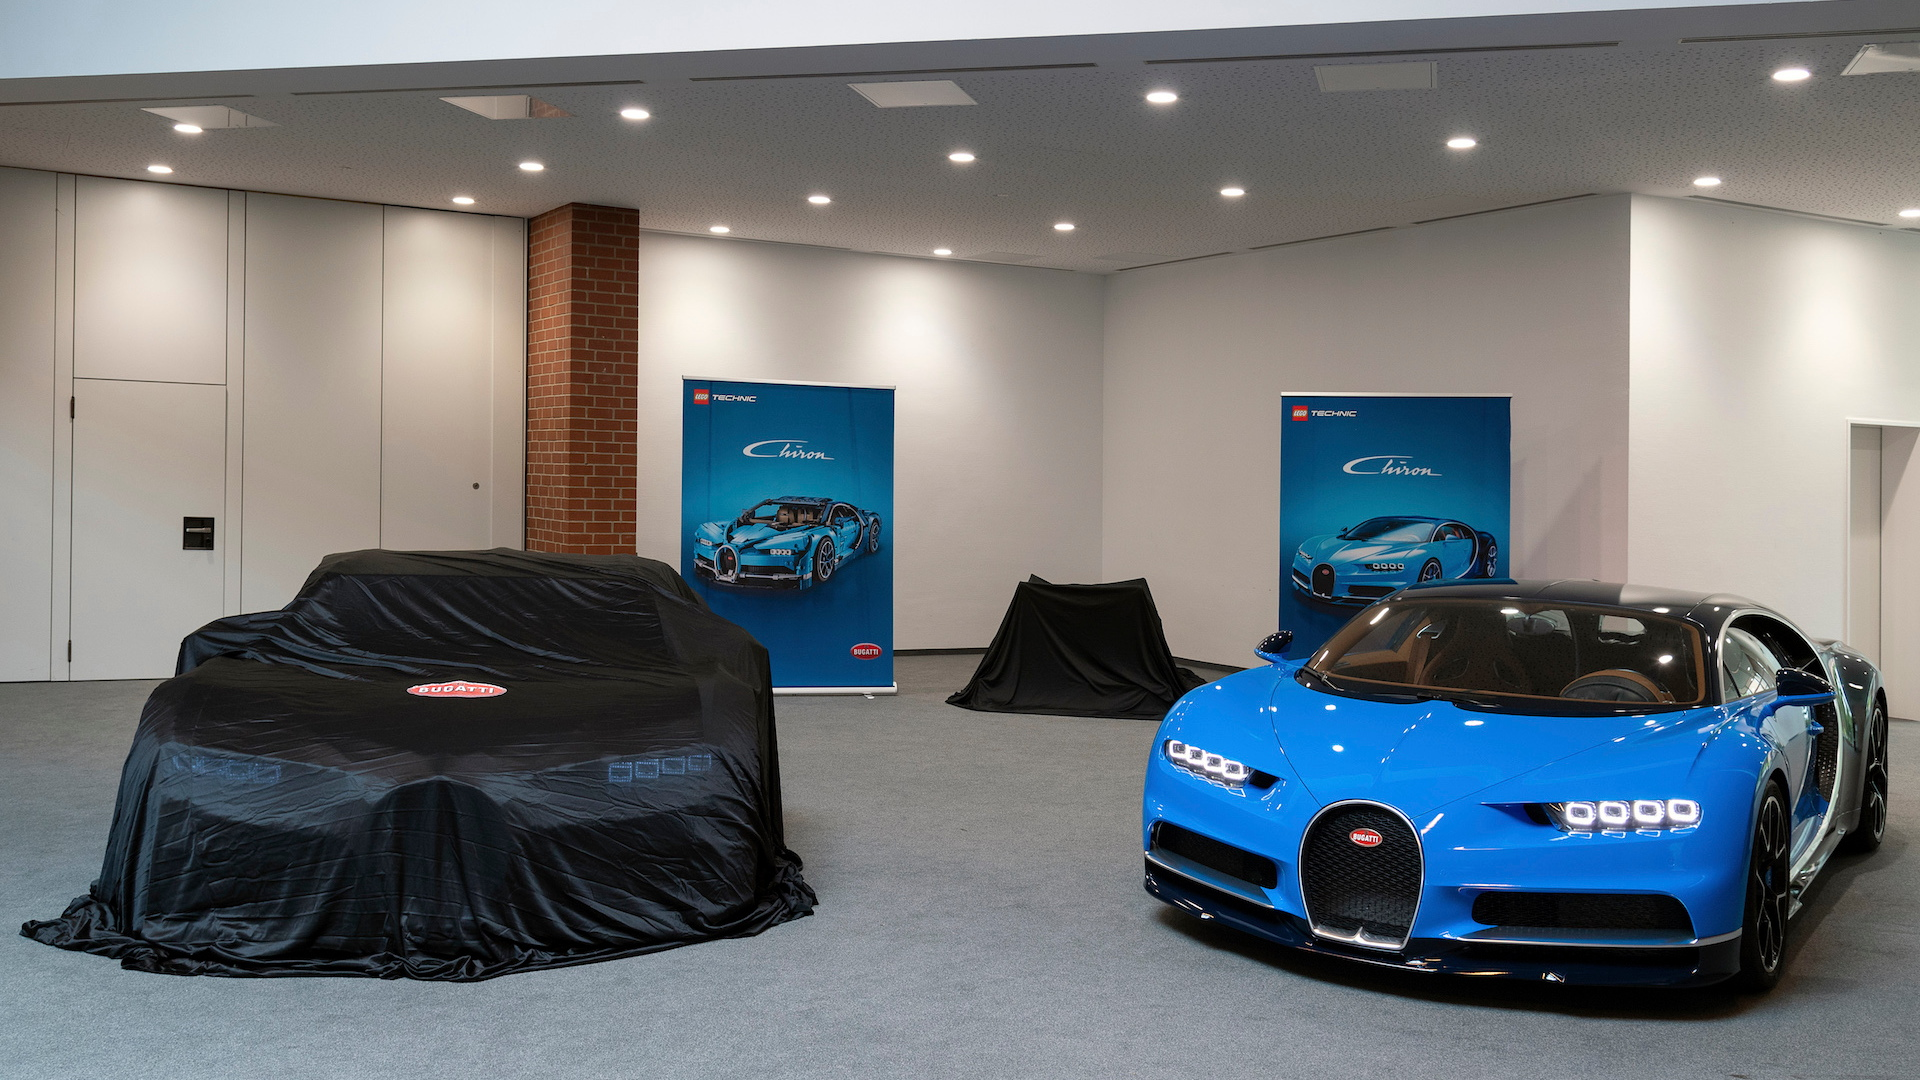 Bugatti Chiron Lego Technic life-size model